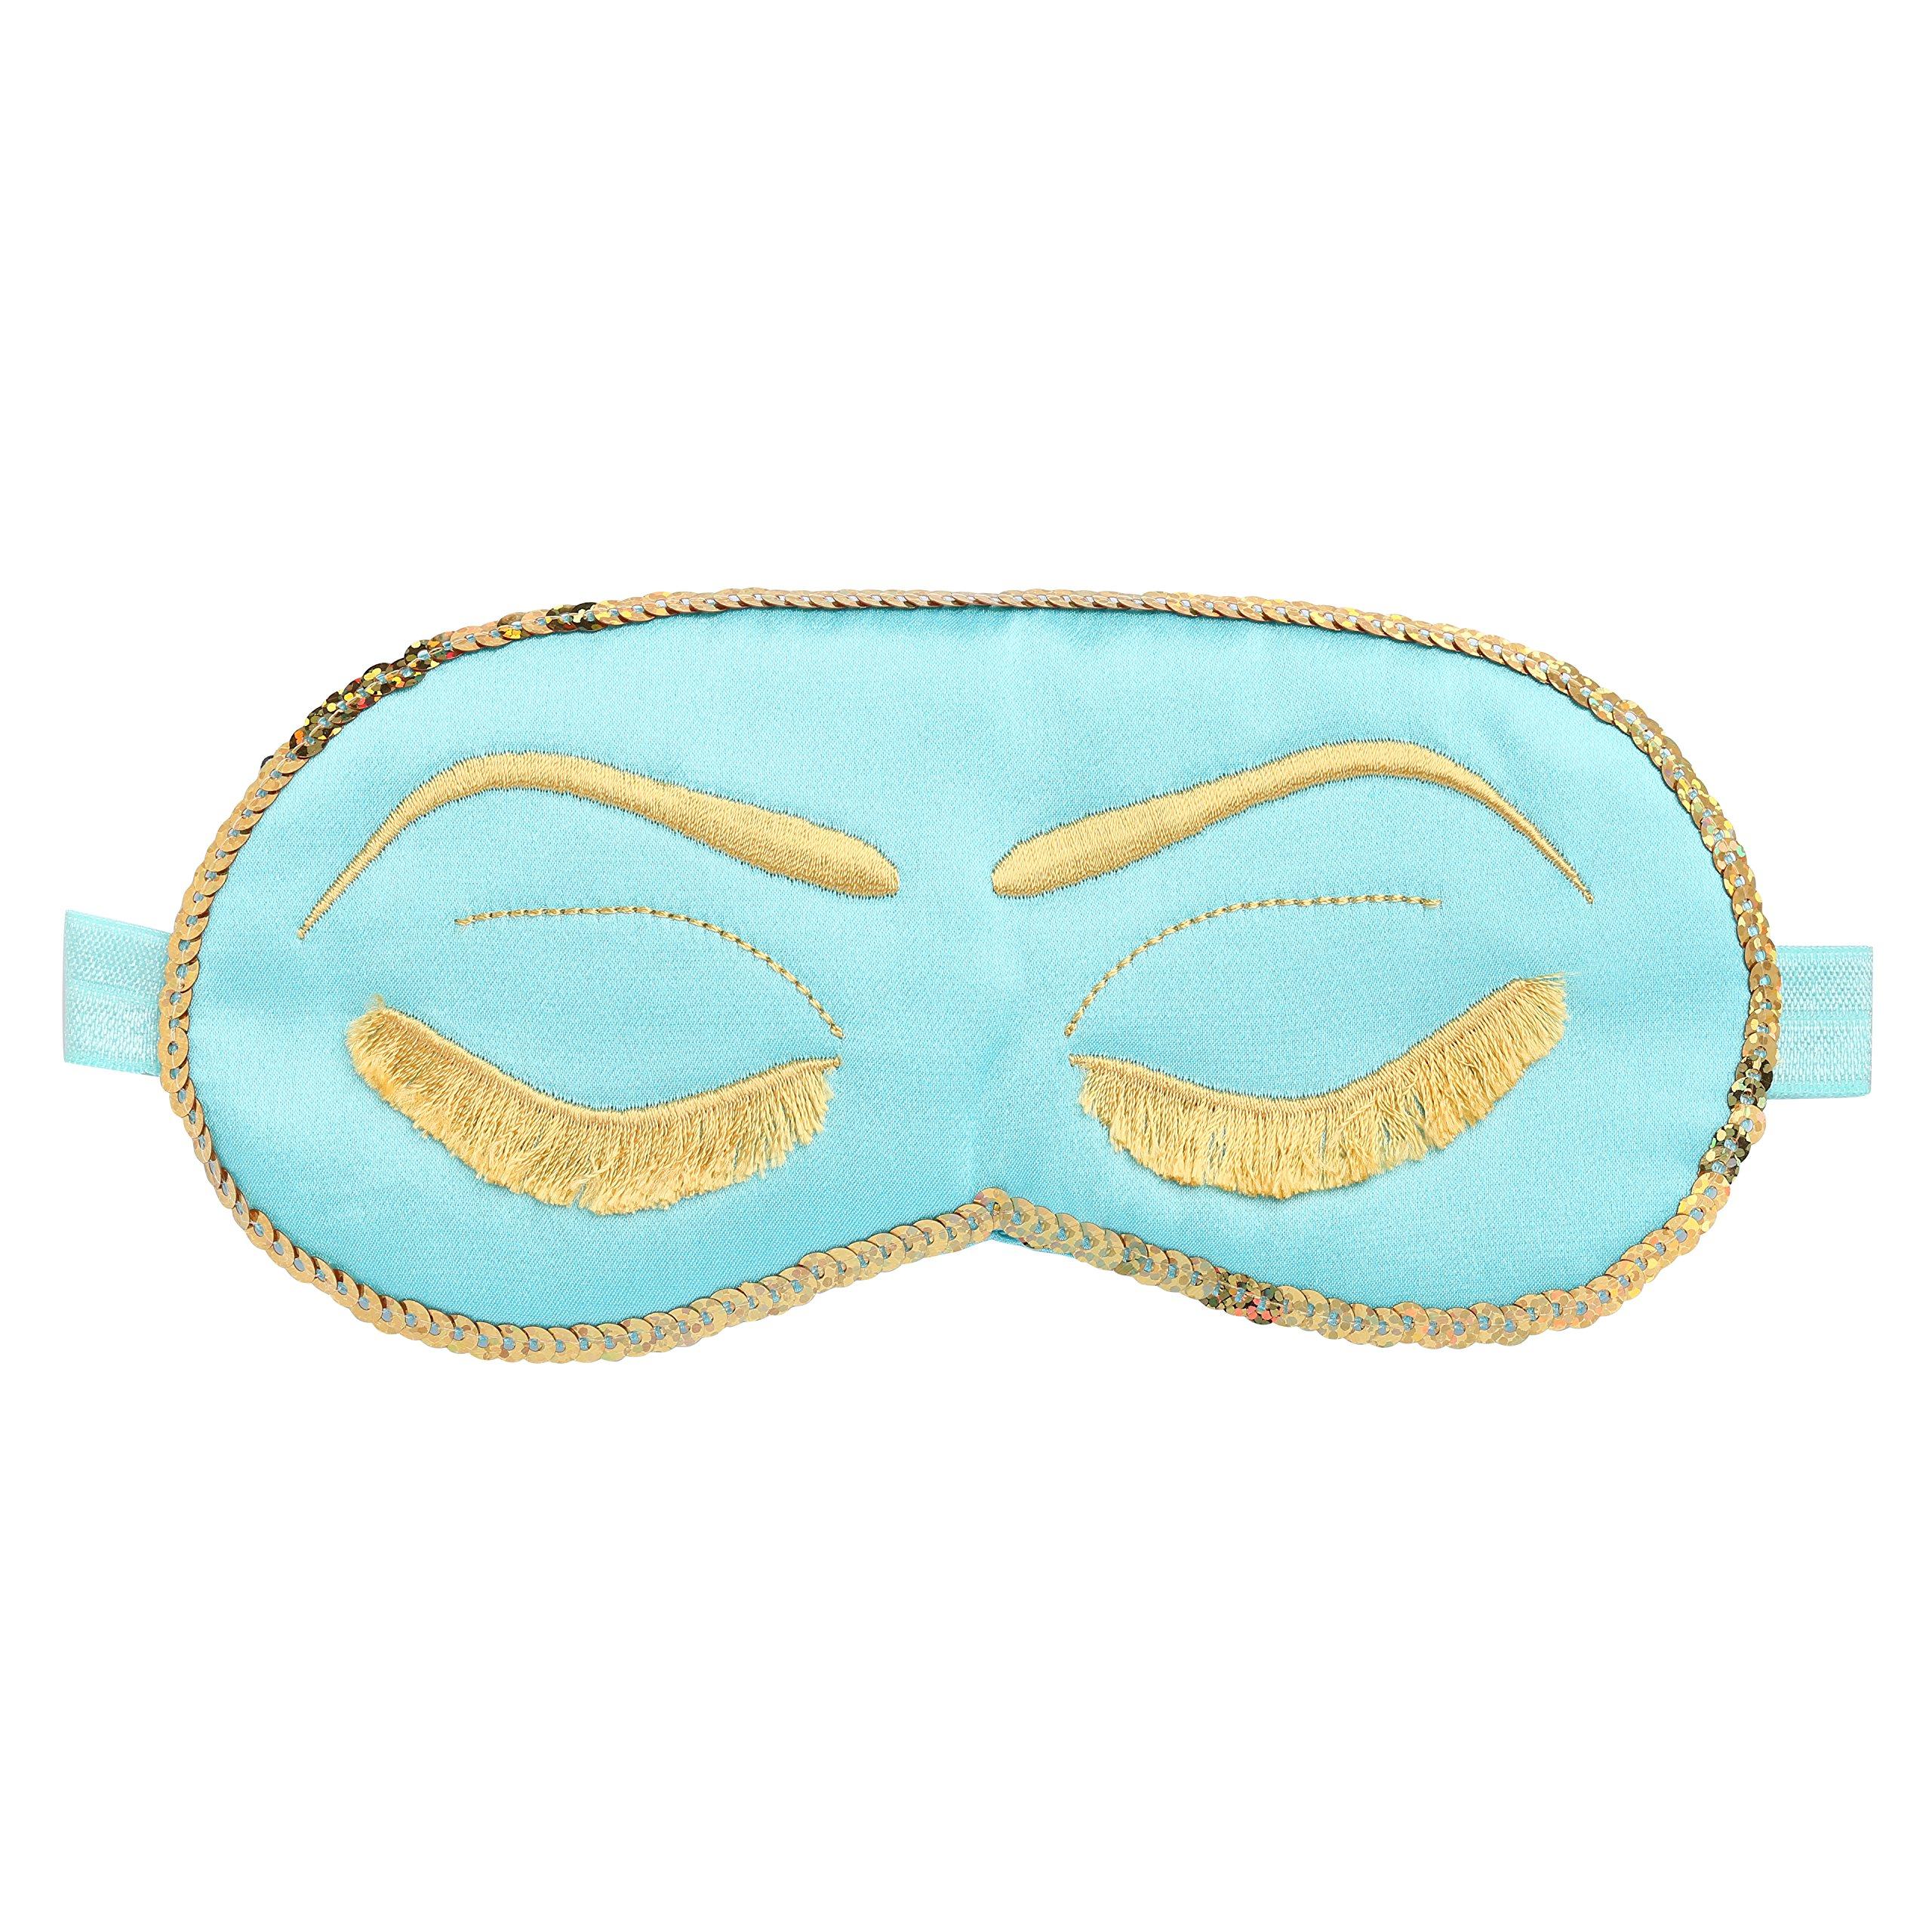 BABEYOND Sleeping Eye Mask for Women Cute Eye Mask Sleeping Beauty Eye Mask Eye Cover Mask Sleep Mask (blue)